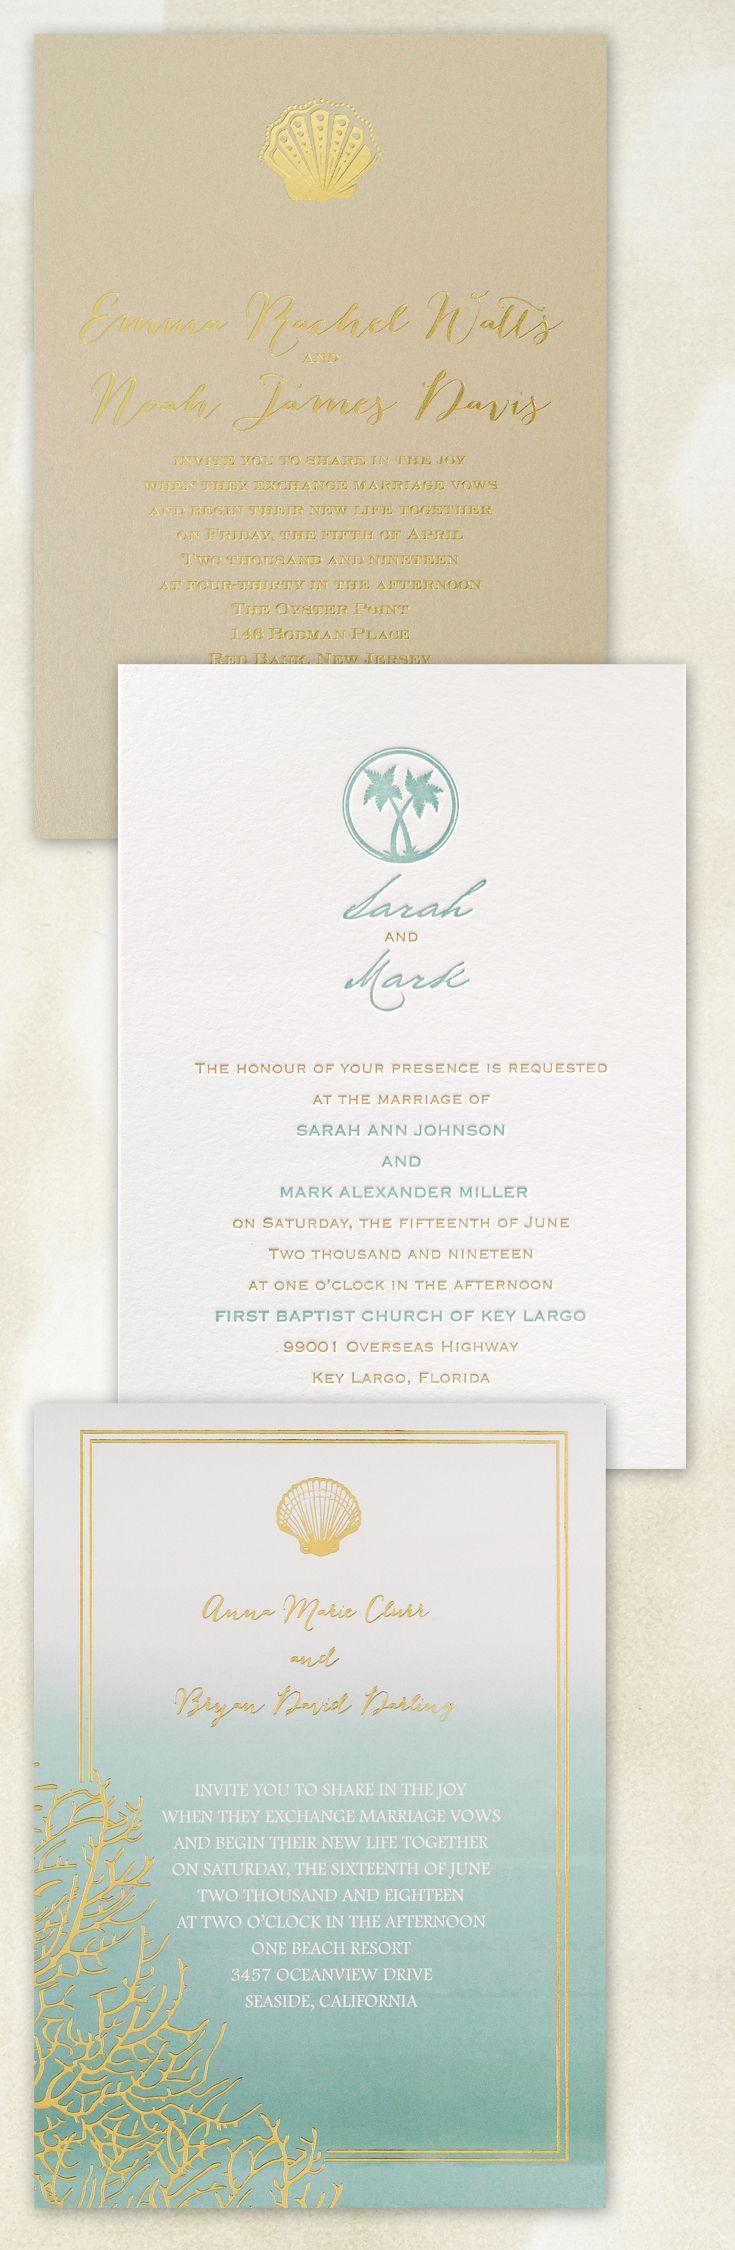 24 best Wedding Invitations + Paper Goods images on Pinterest ...